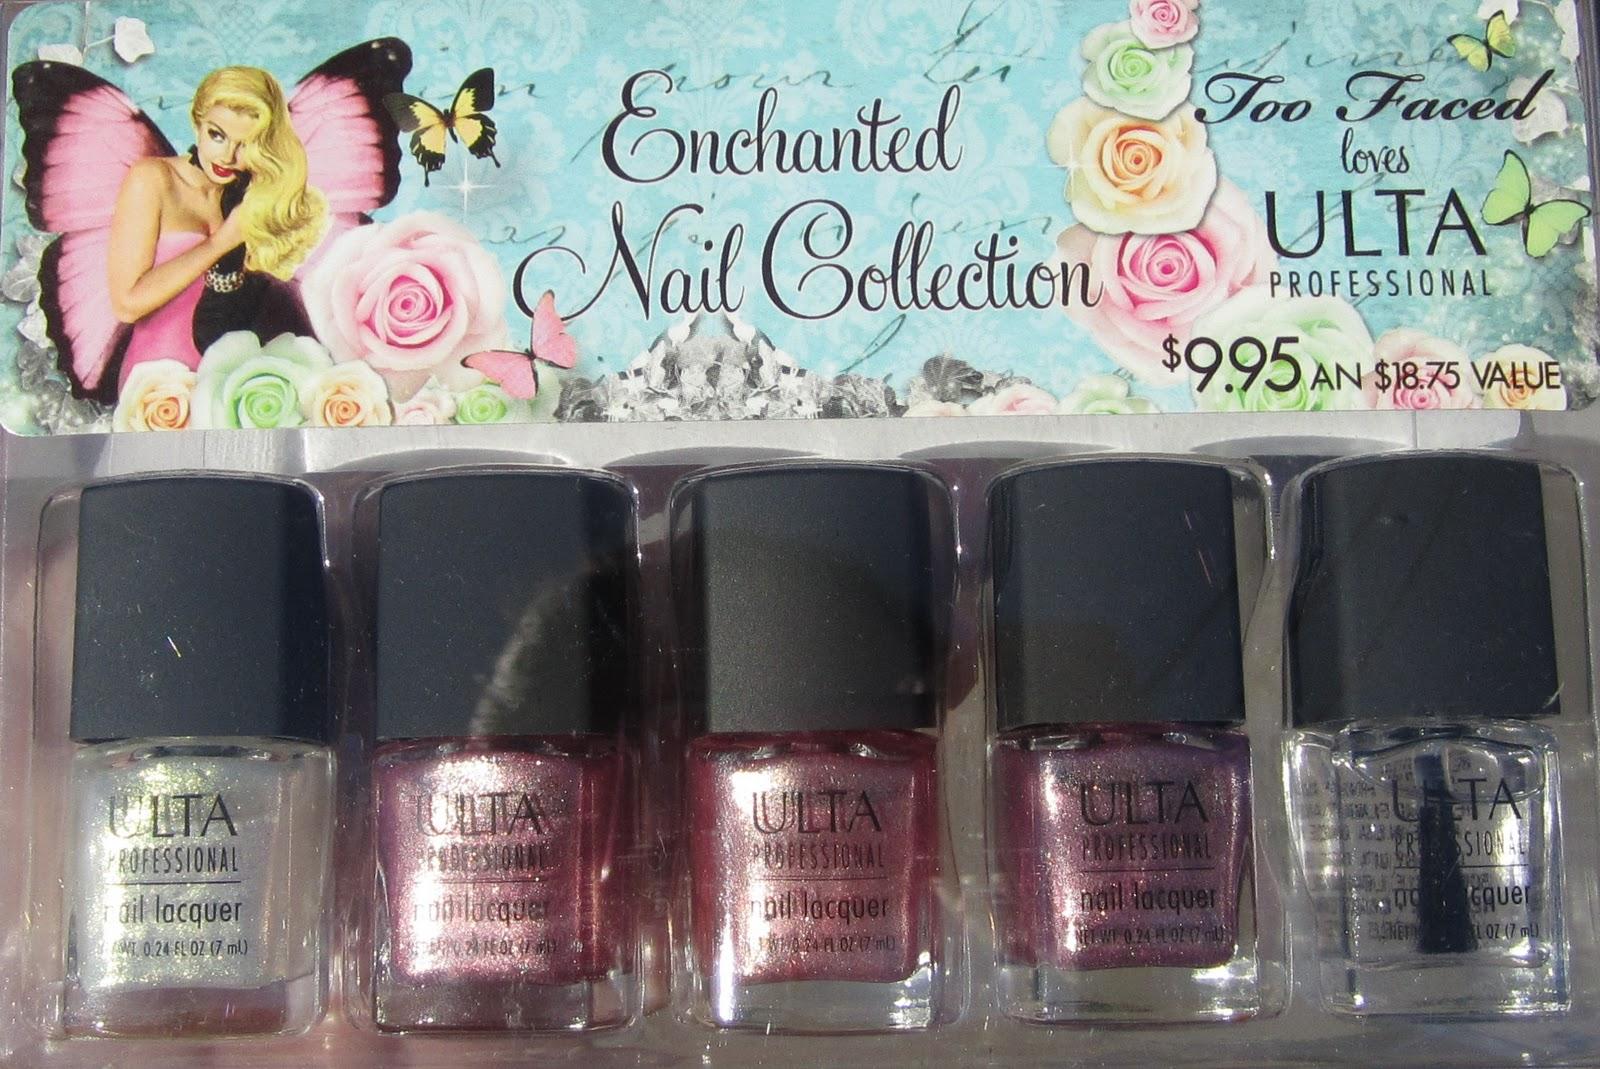 The PolishAholic: Ulta- Enchanted Nail Collection mini set